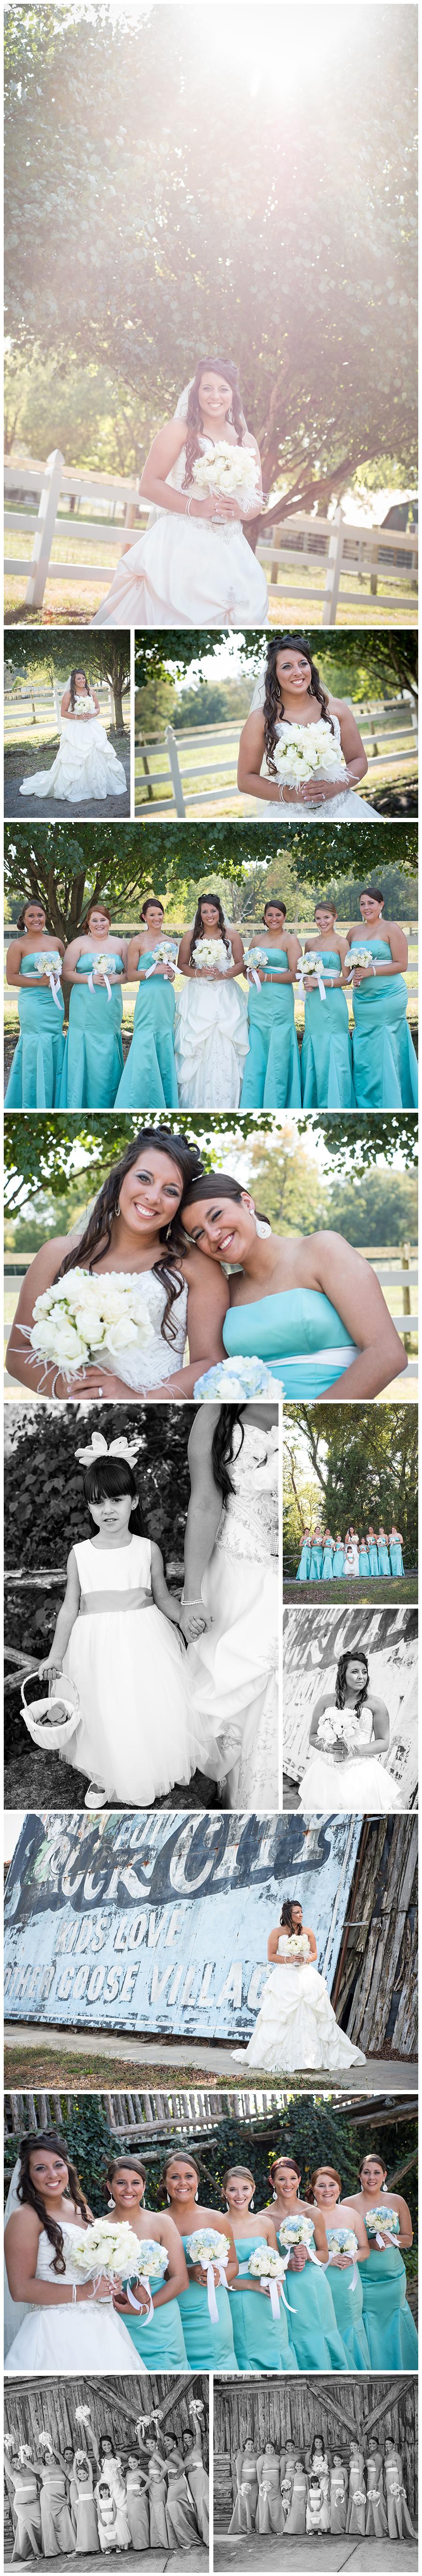 Matt-Blakely-legacy-farms-wedding-photography-nashville